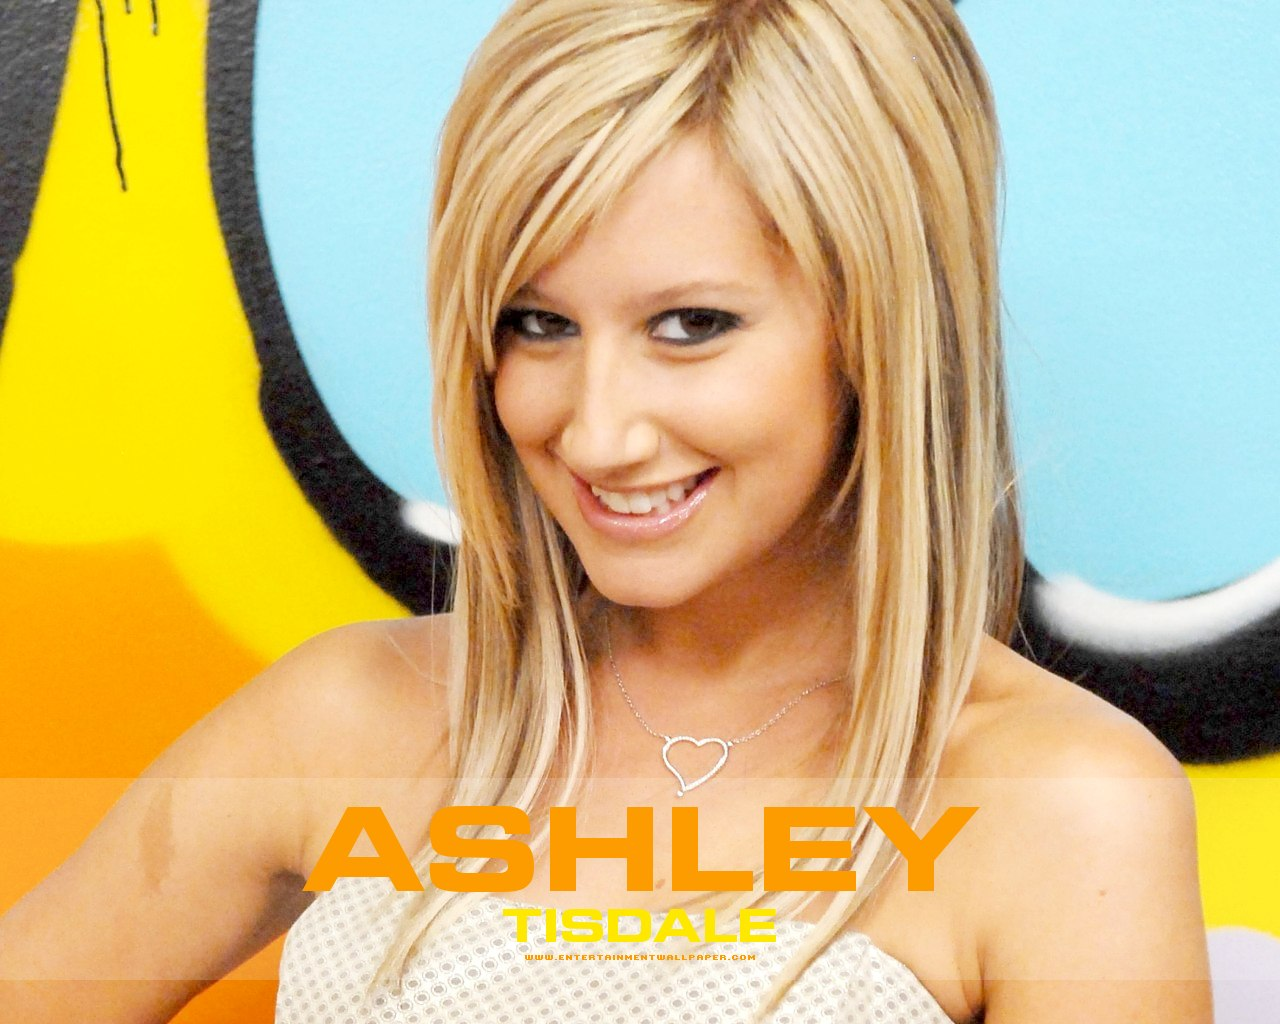 Ashley tisdale celebrity